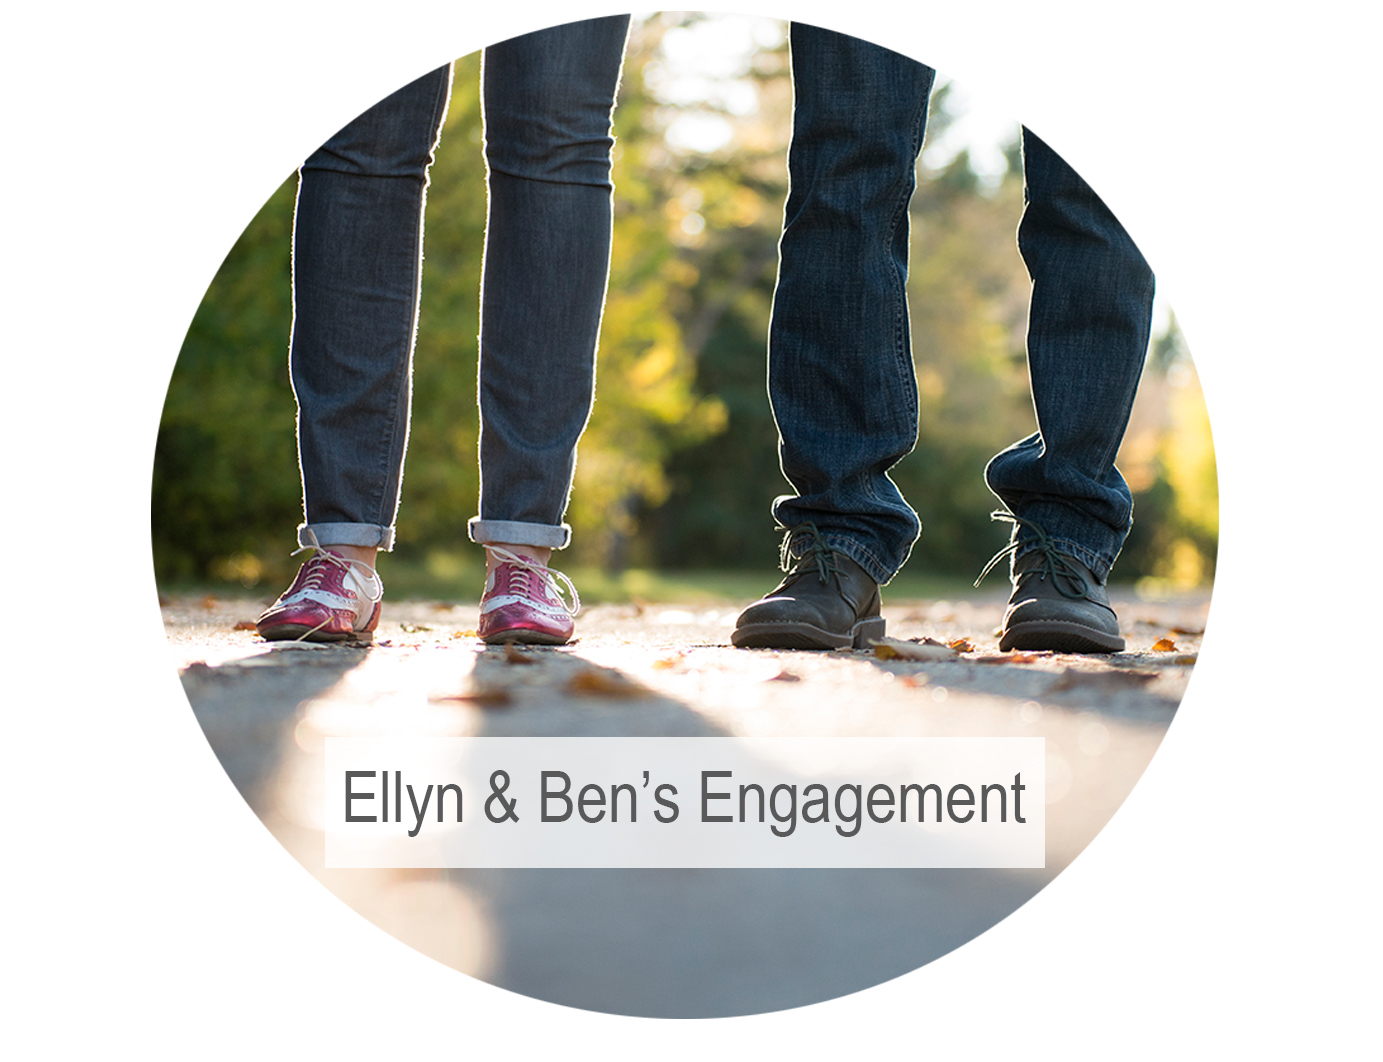 Ellyn&Ben'sengagement.jpg